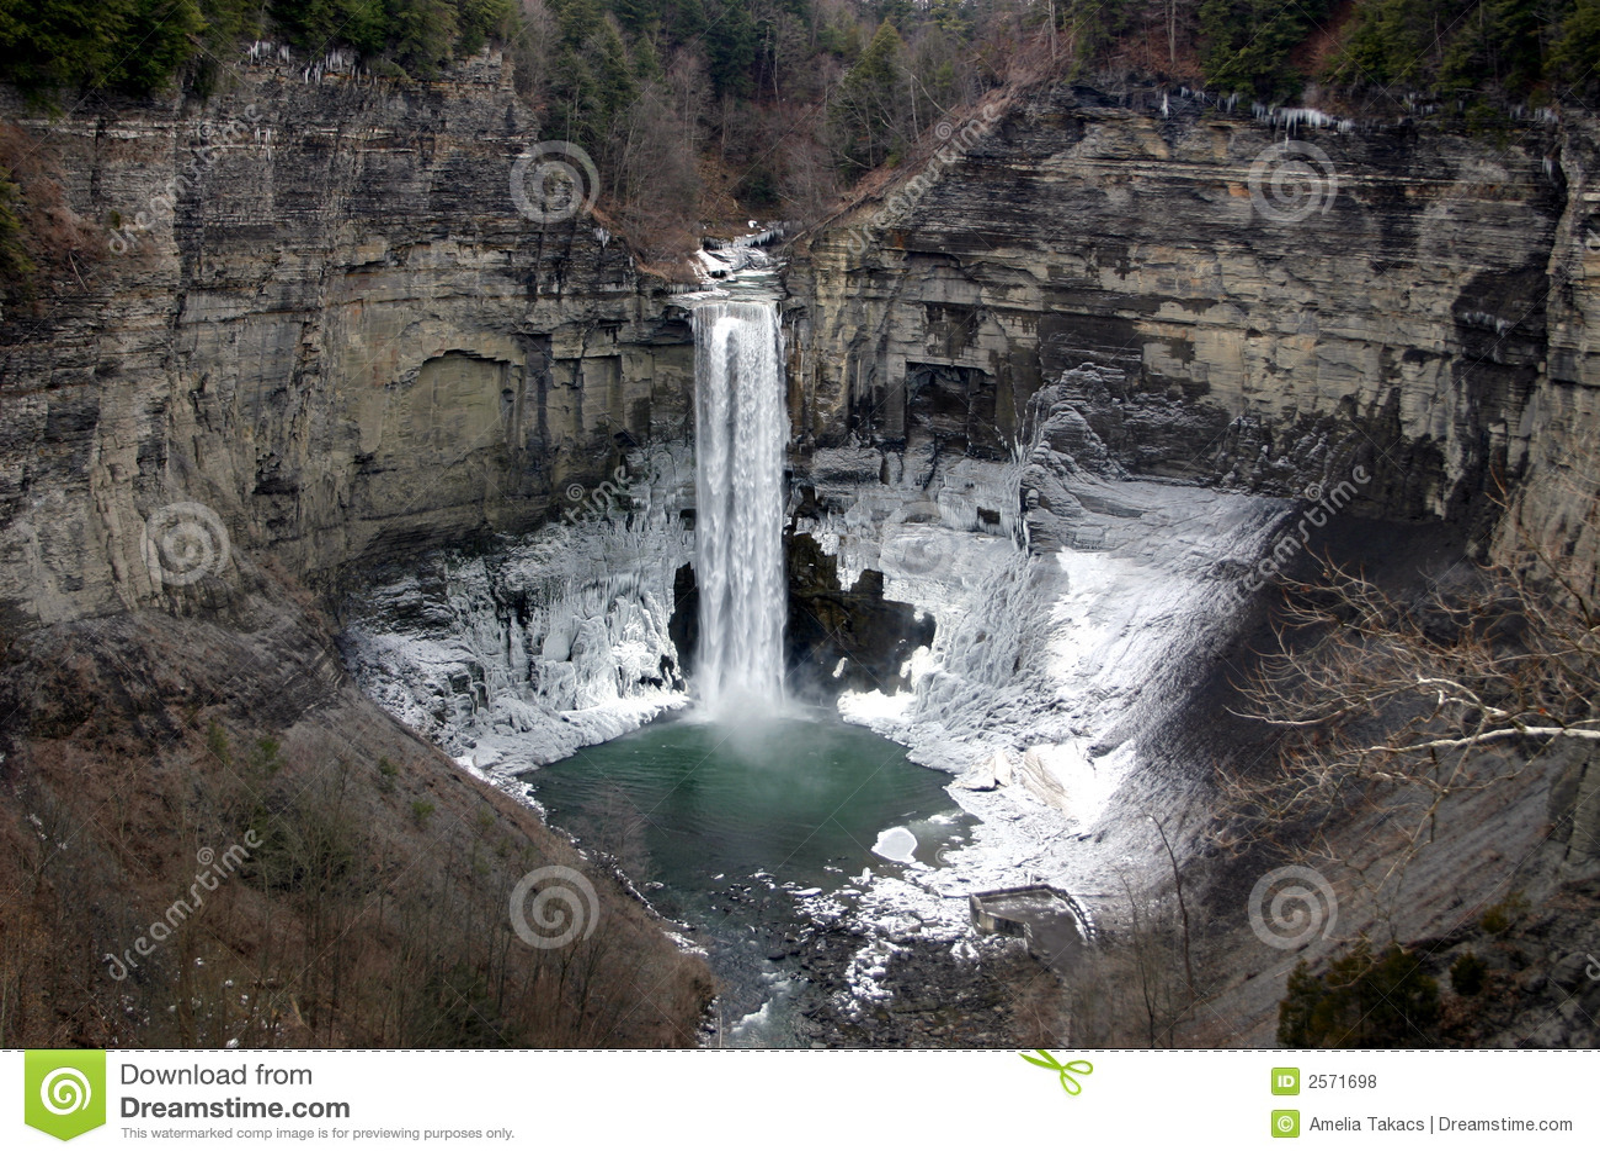 Taughannock Falls - New York